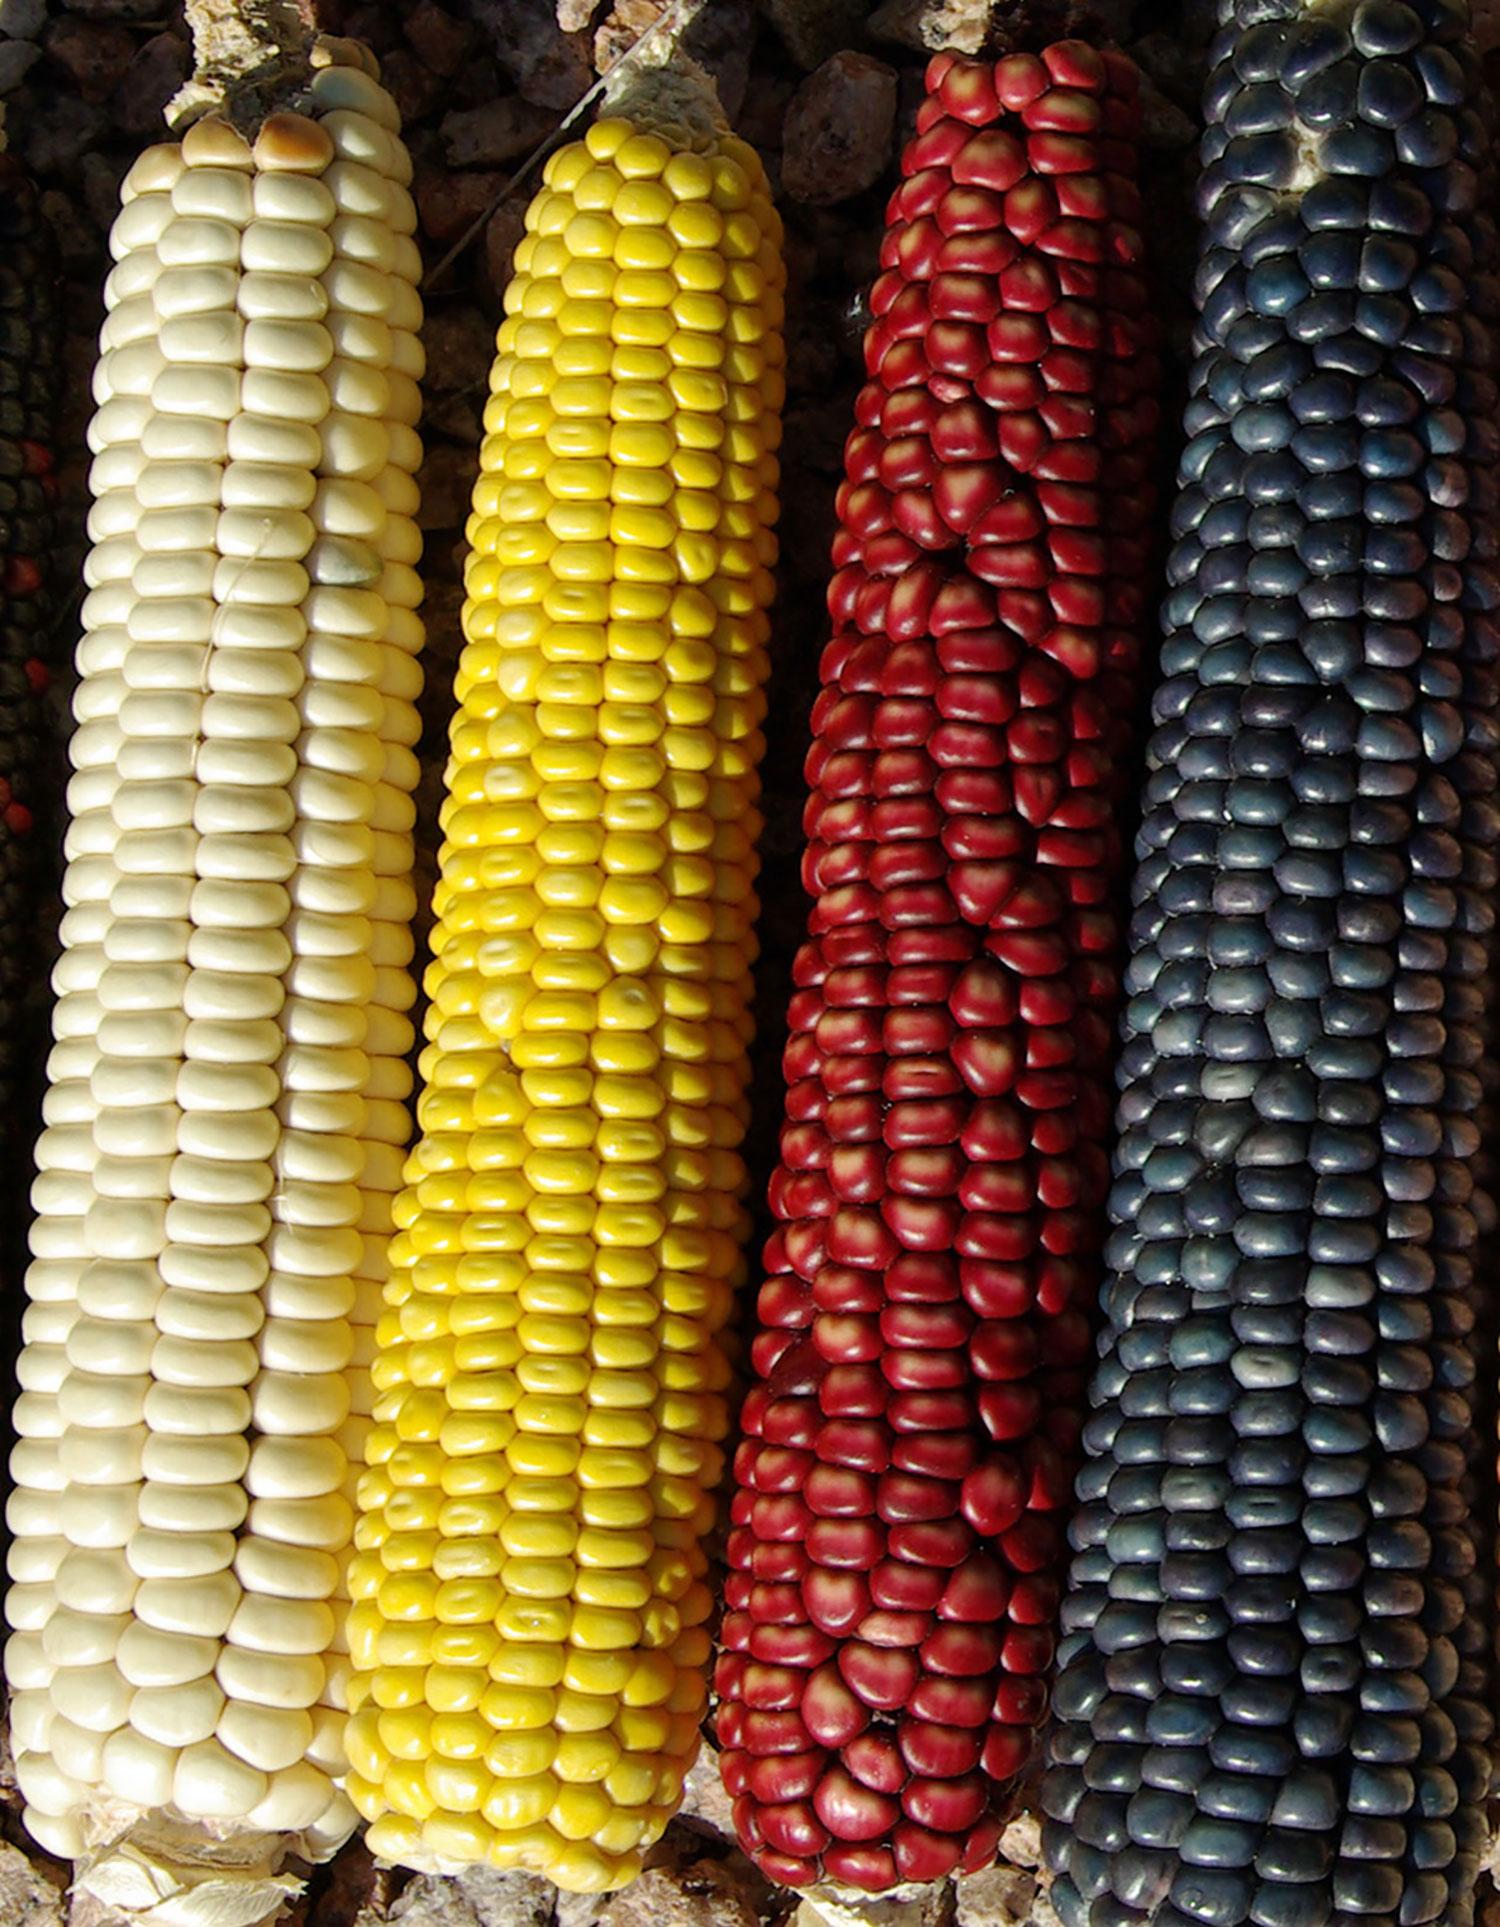 Four colours of maize.